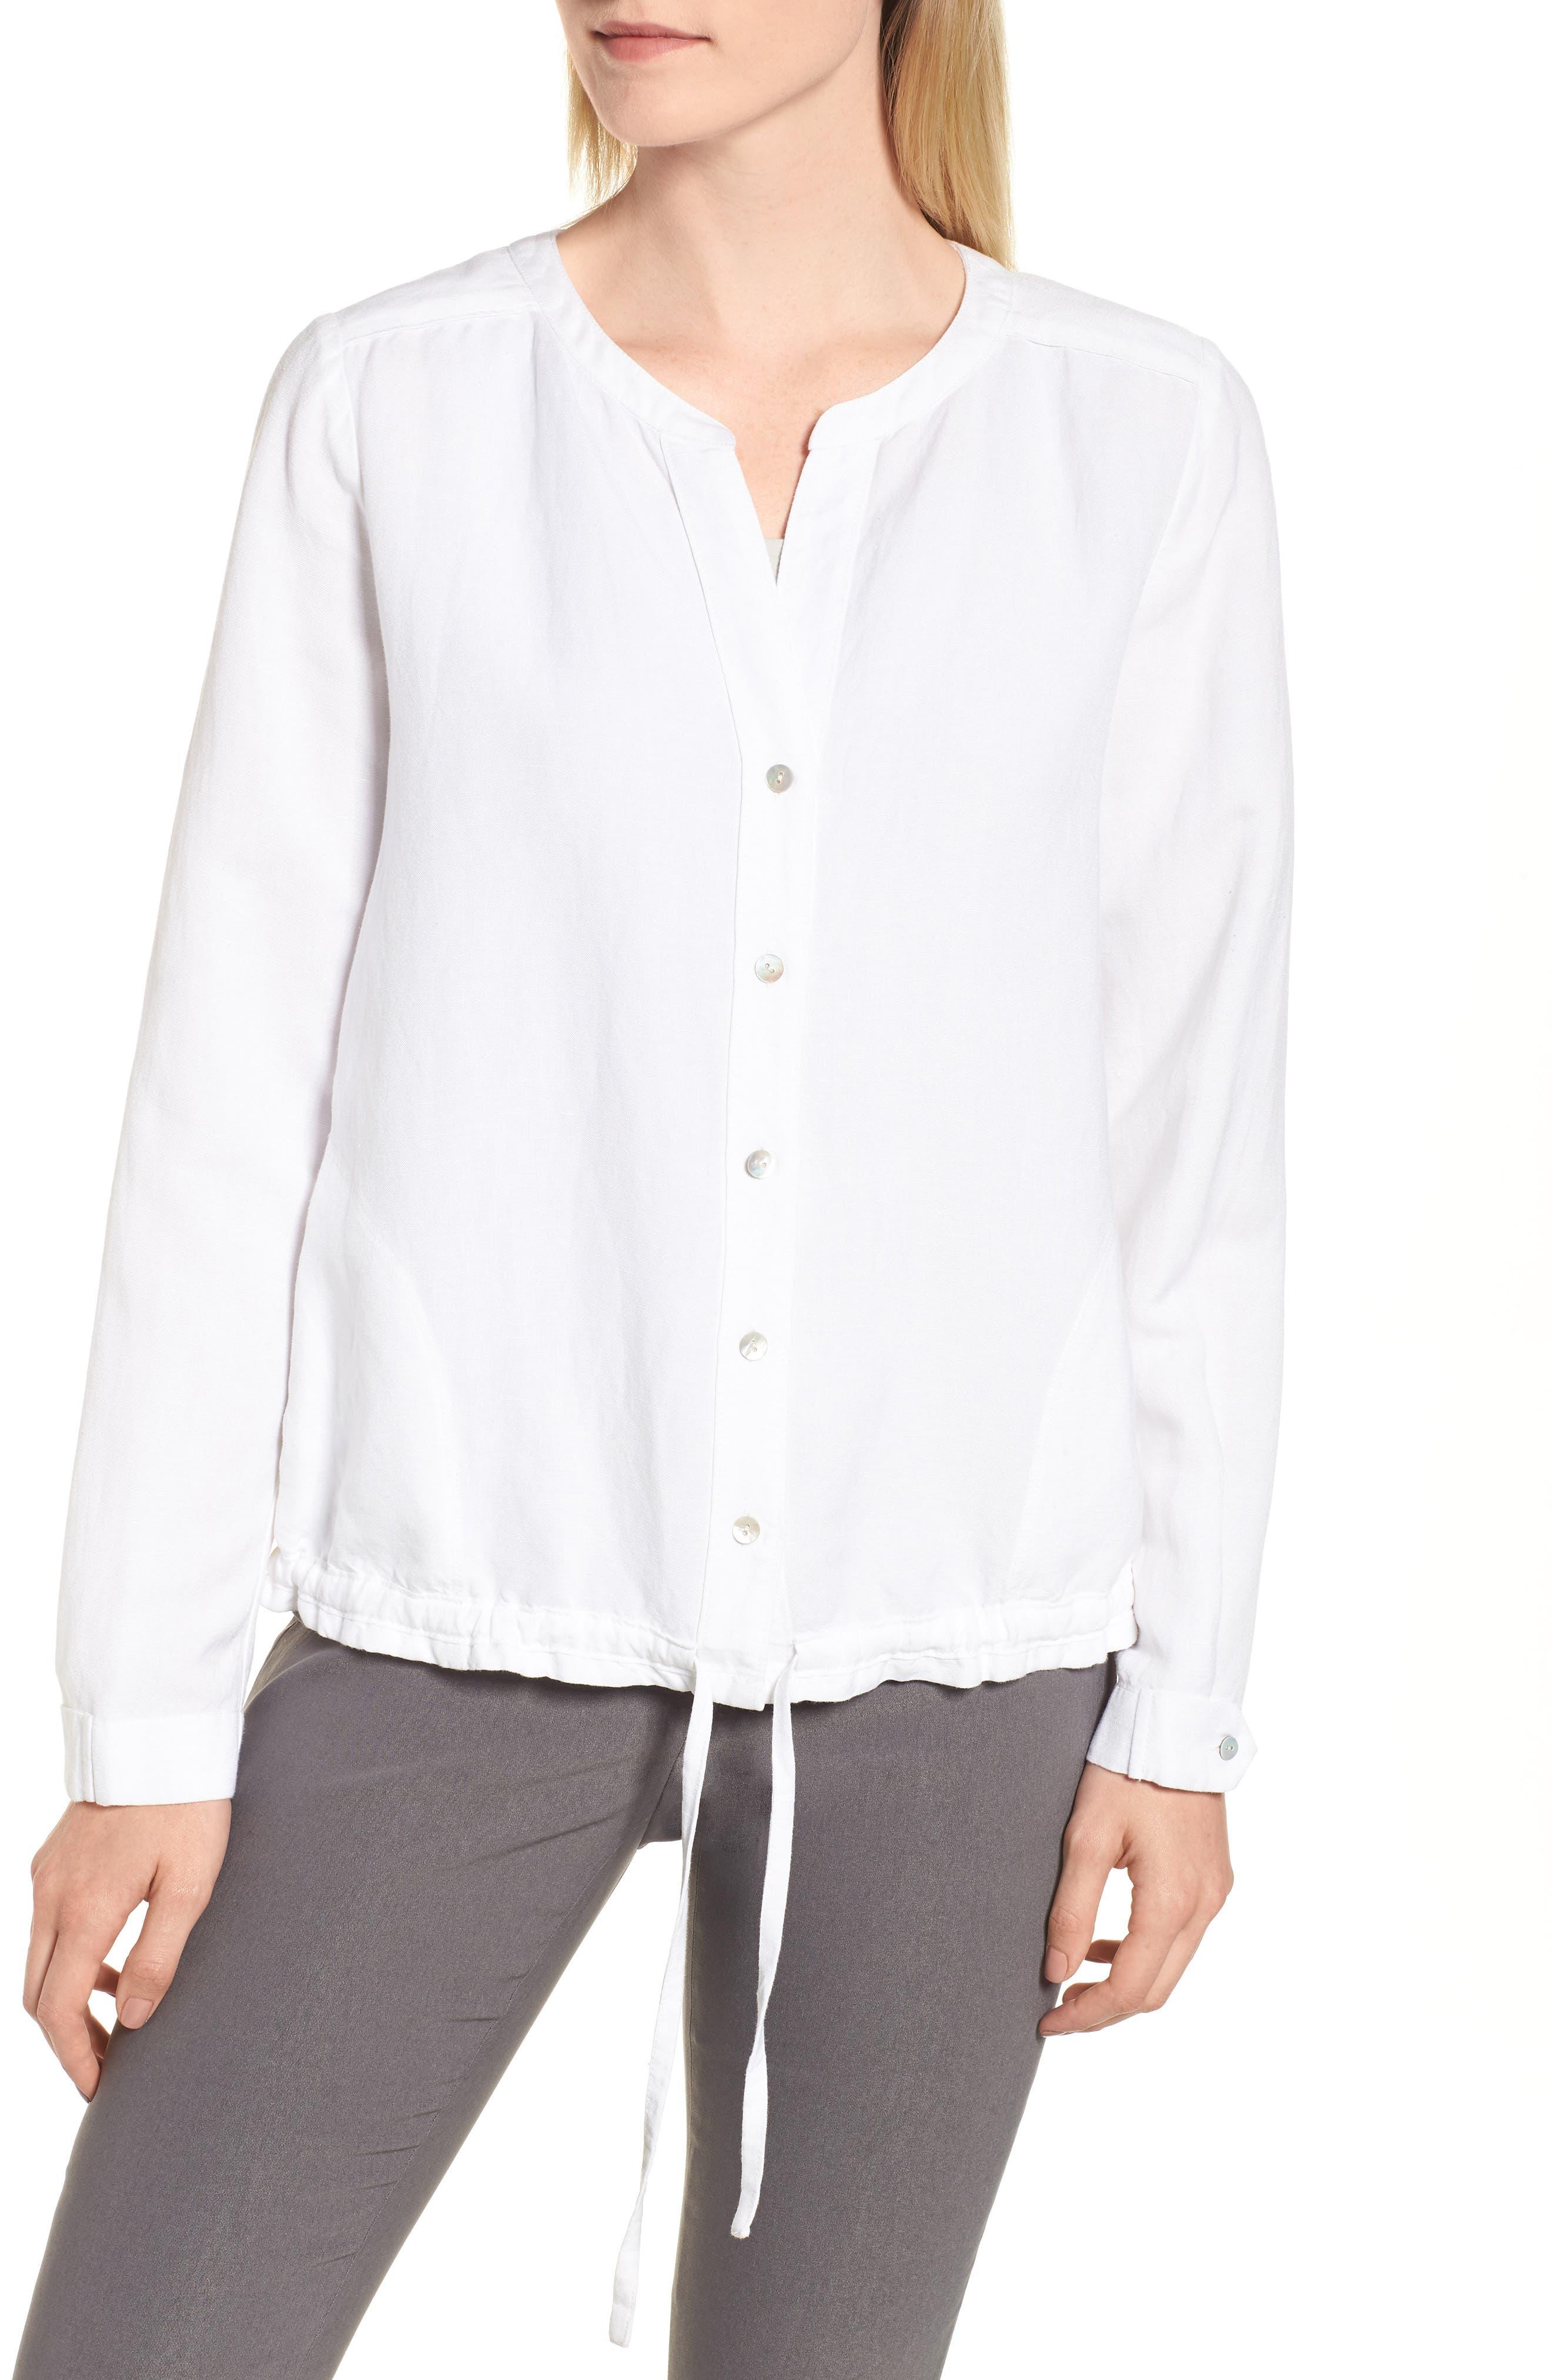 Homebound Linen Blend Drawstring Jacket,                             Alternate thumbnail 4, color,                             123